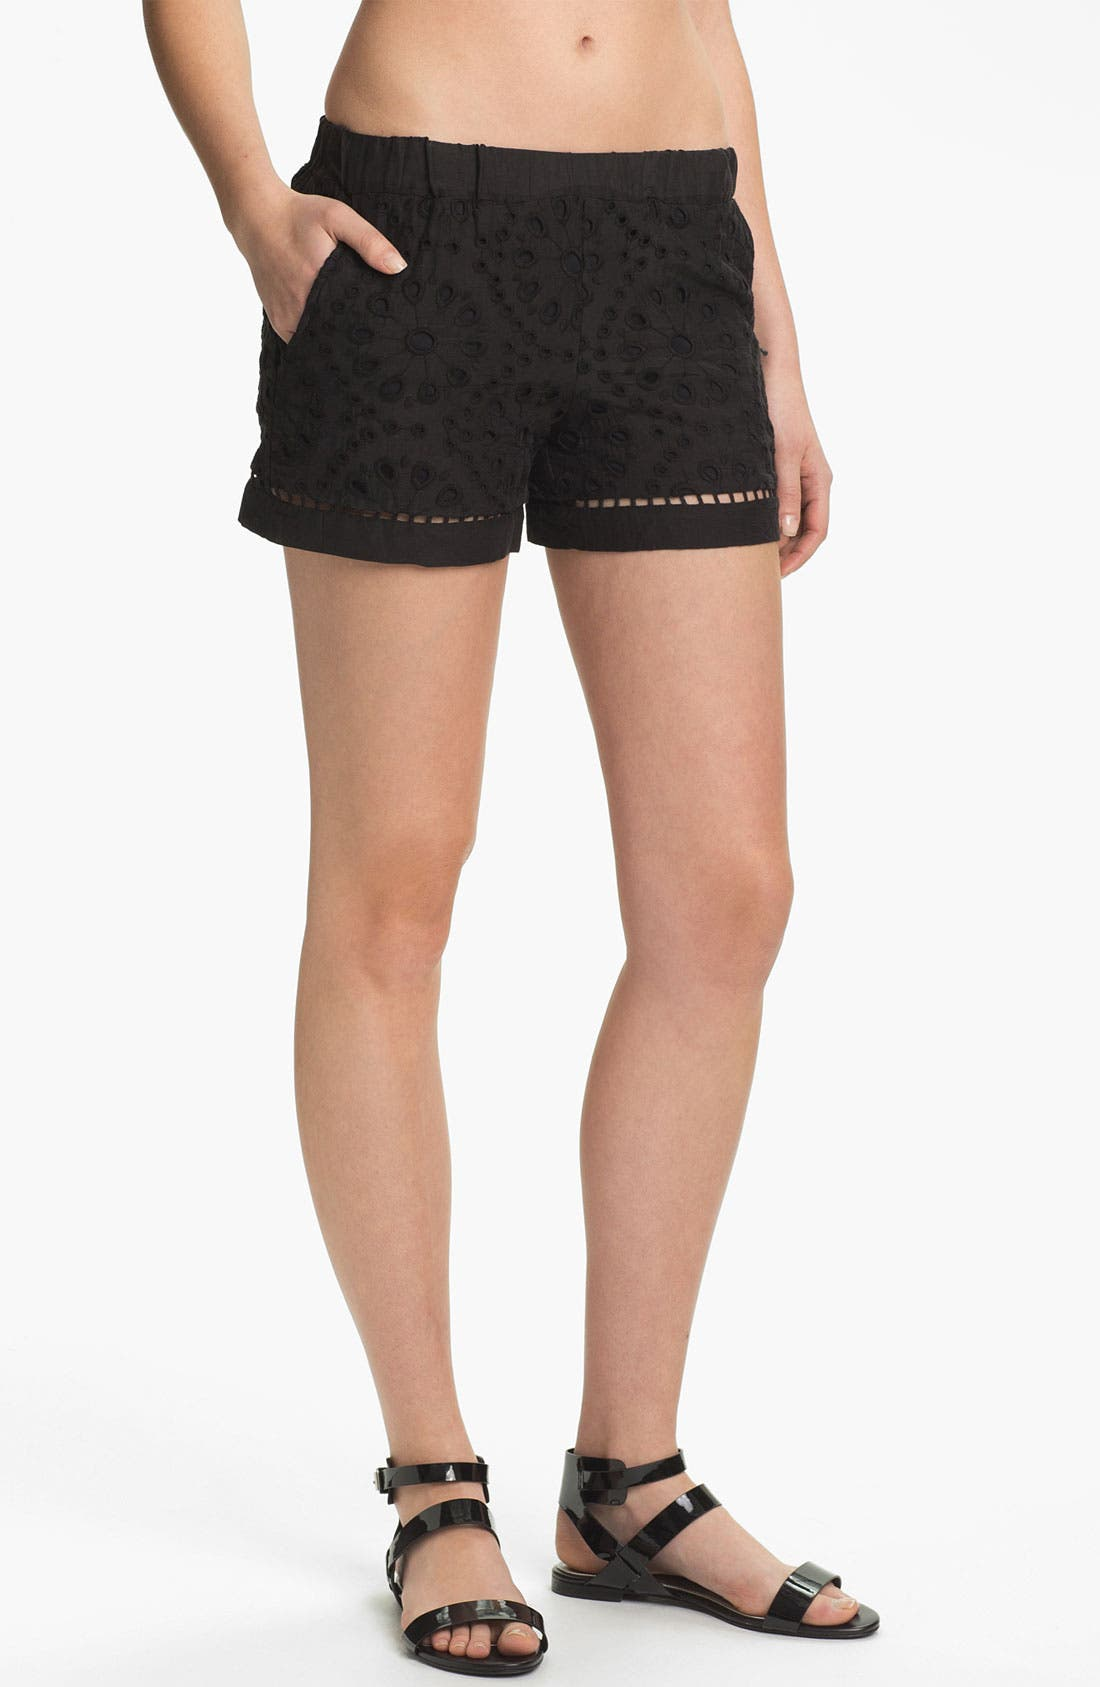 Main Image - Ella Moss 'Heidi' Eyelet Lace Shorts